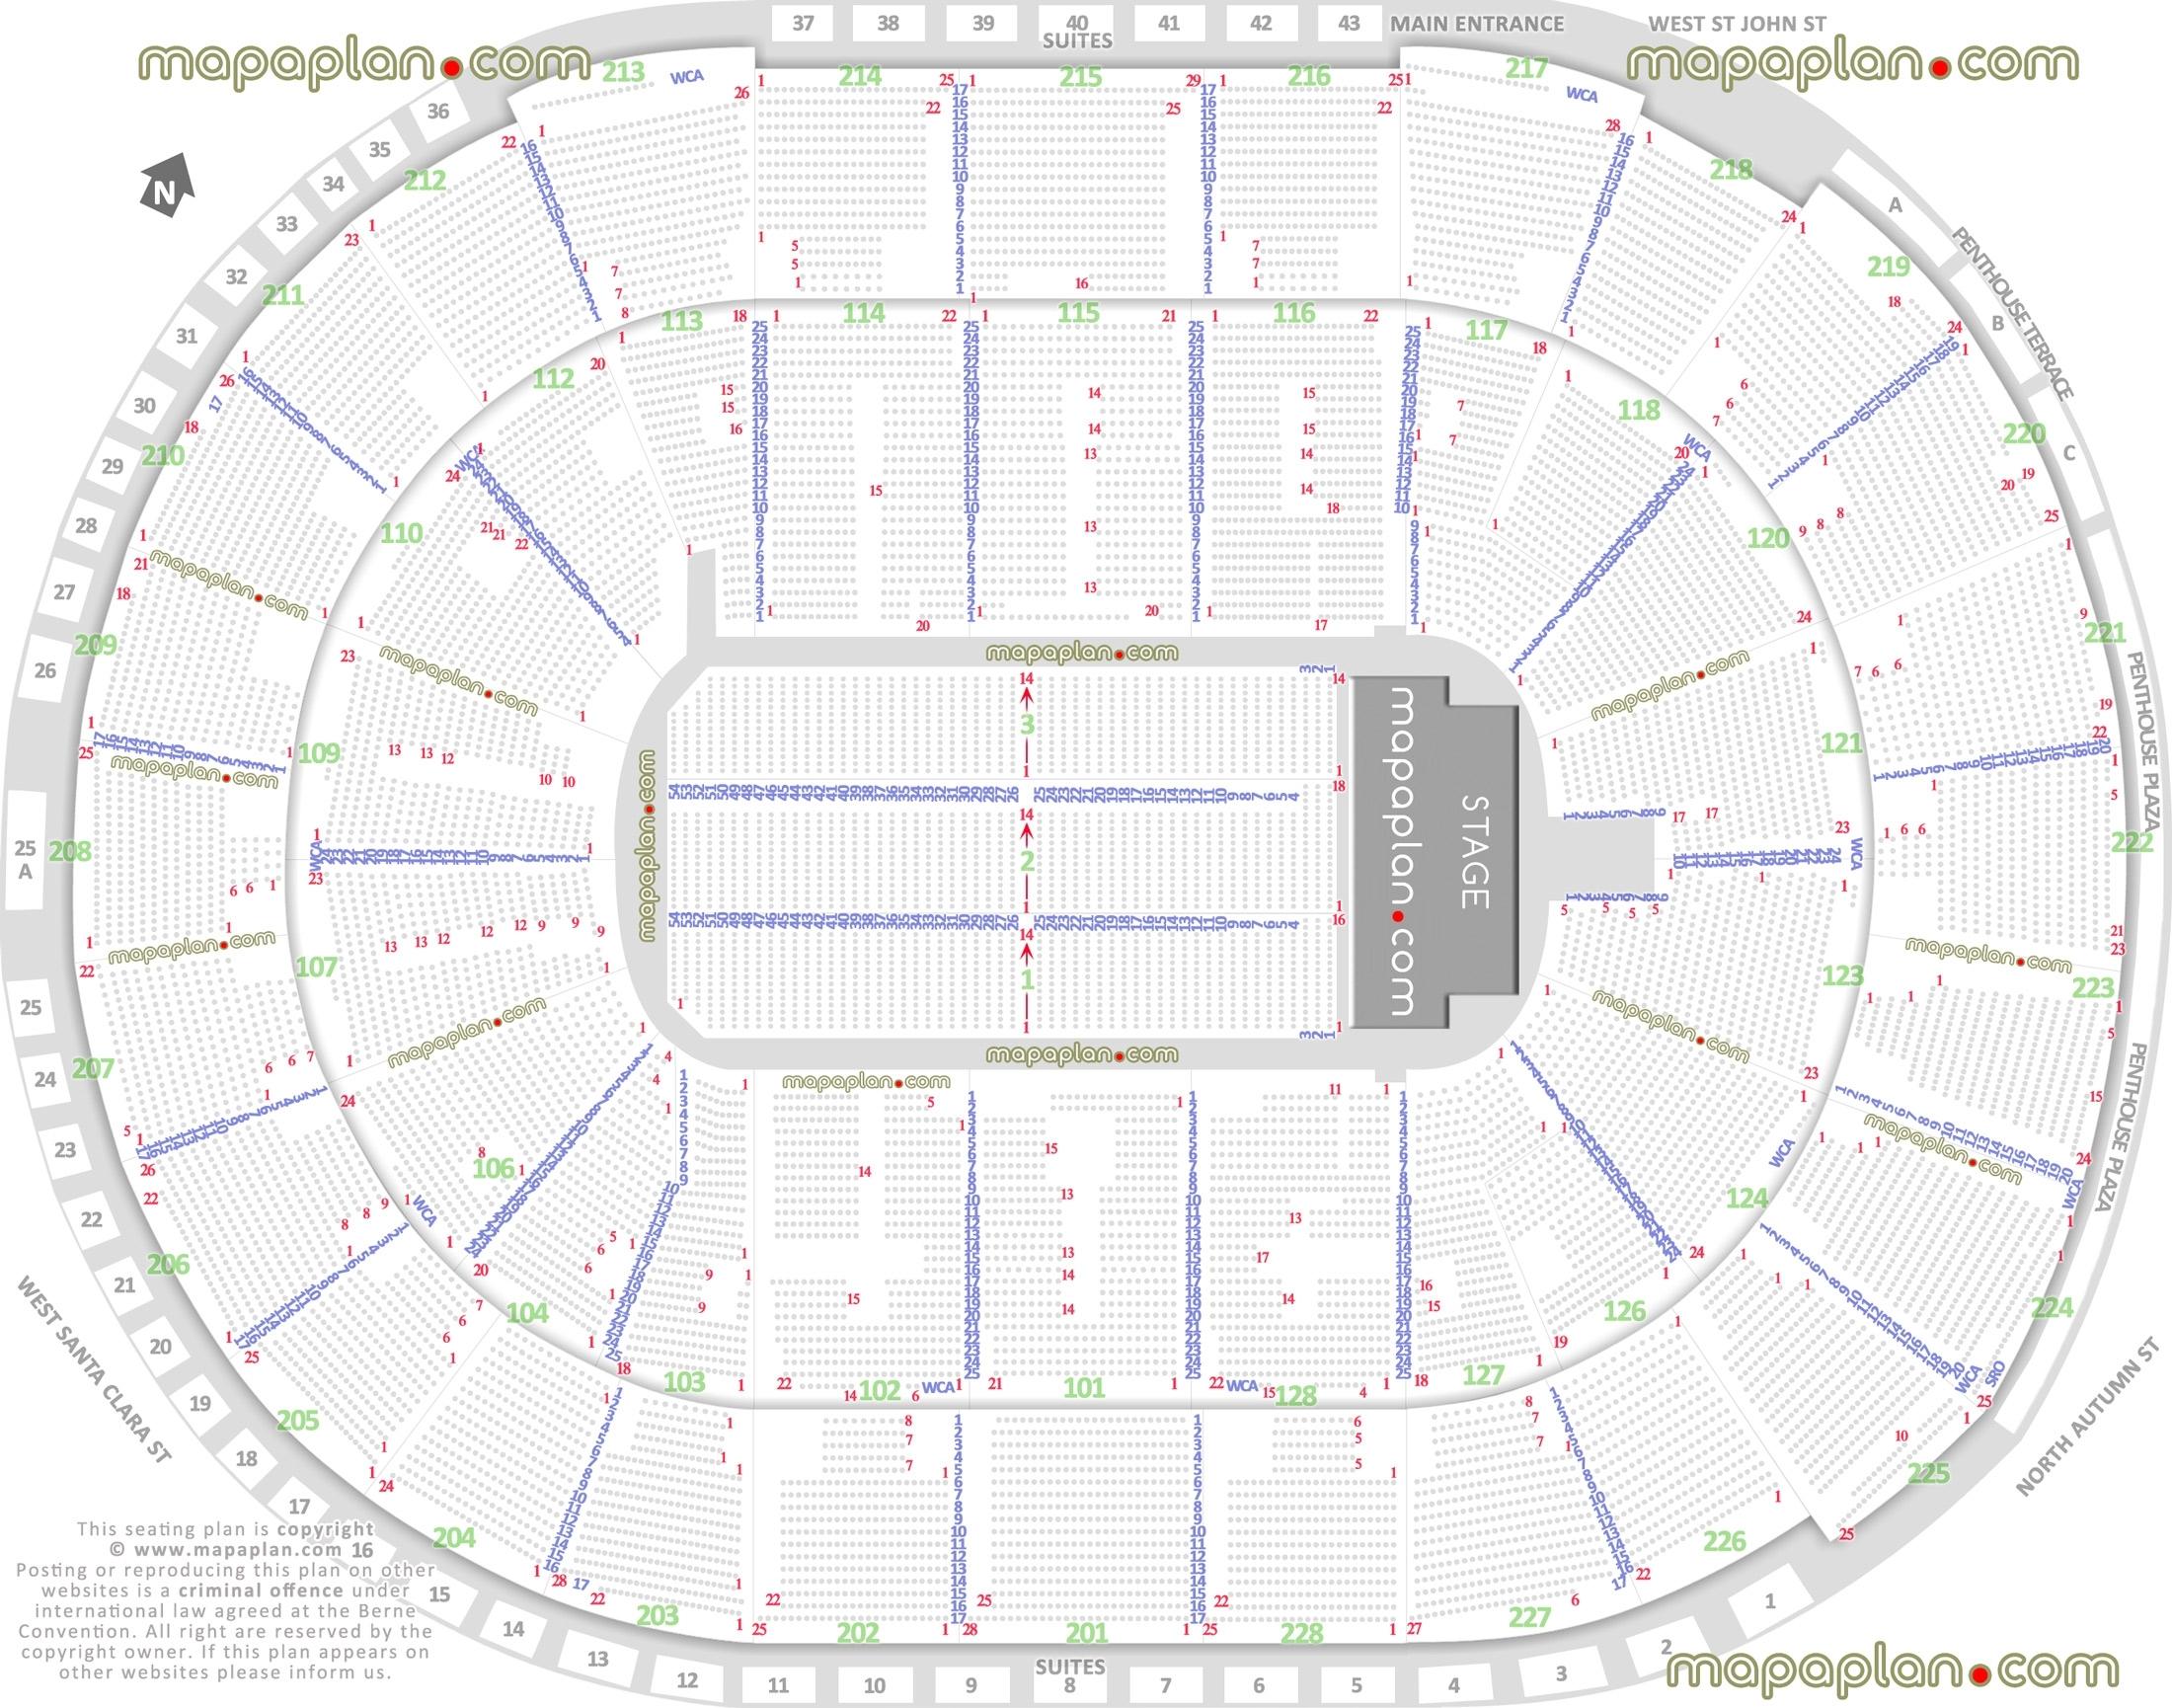 Sap Center Seat & Row Numbers Detailed Seating Chart, San Jose inside Verizon Center Seating Chart Pdf